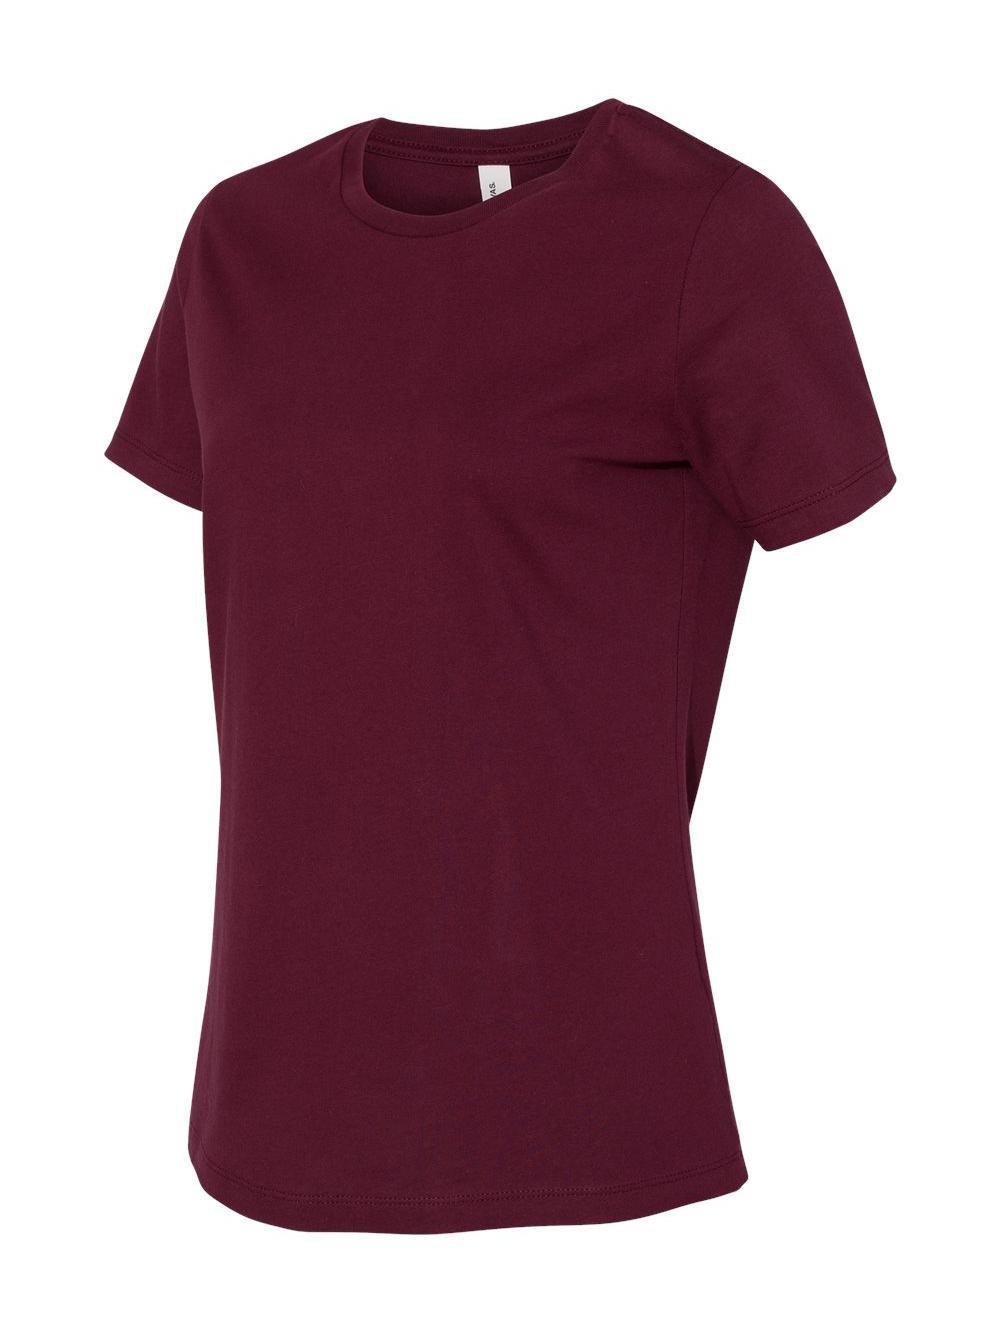 Bella-Canvas-Women-039-s-Relaxed-Short-Sleeve-Jersey-Tee-6400 thumbnail 53